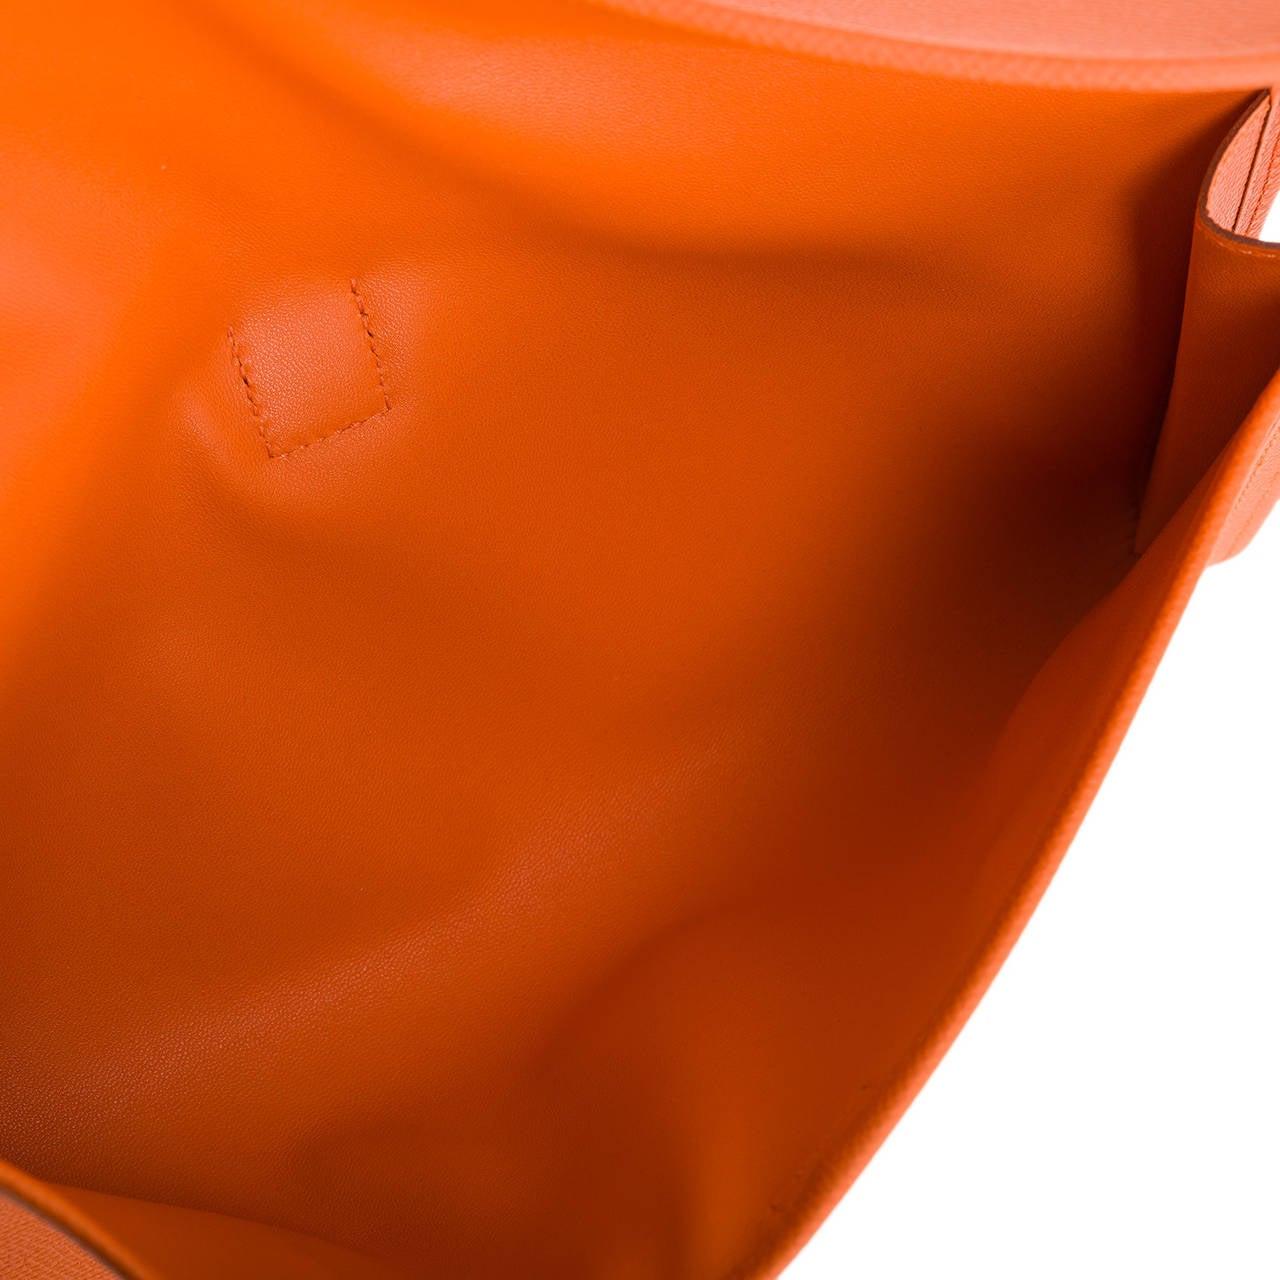 hermes dogon wallet replica - hermes jige elan epsom clutch bag in orange, hermes women bags